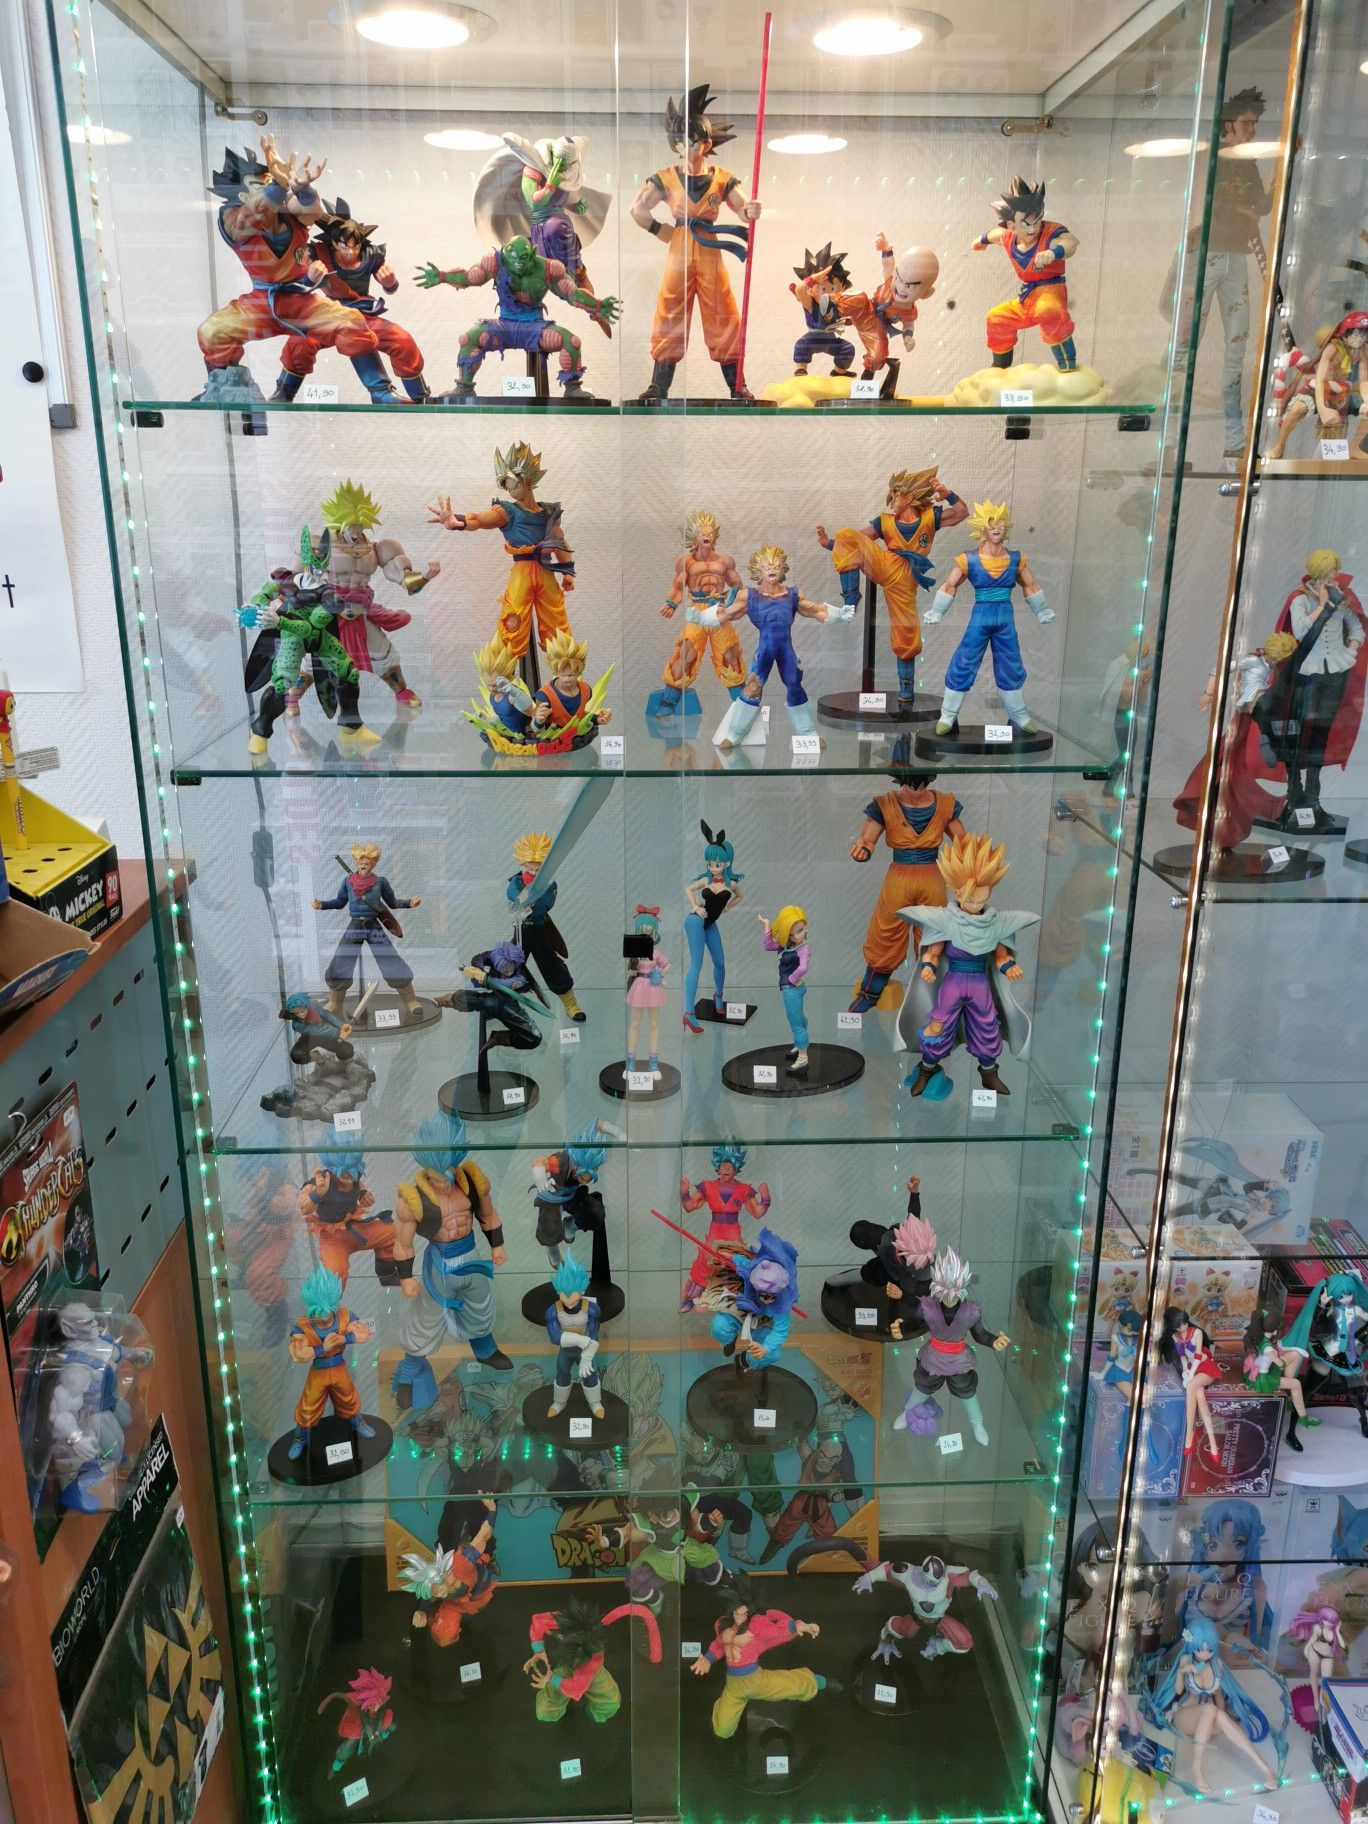 vitrine dbz marvel infinity figurine